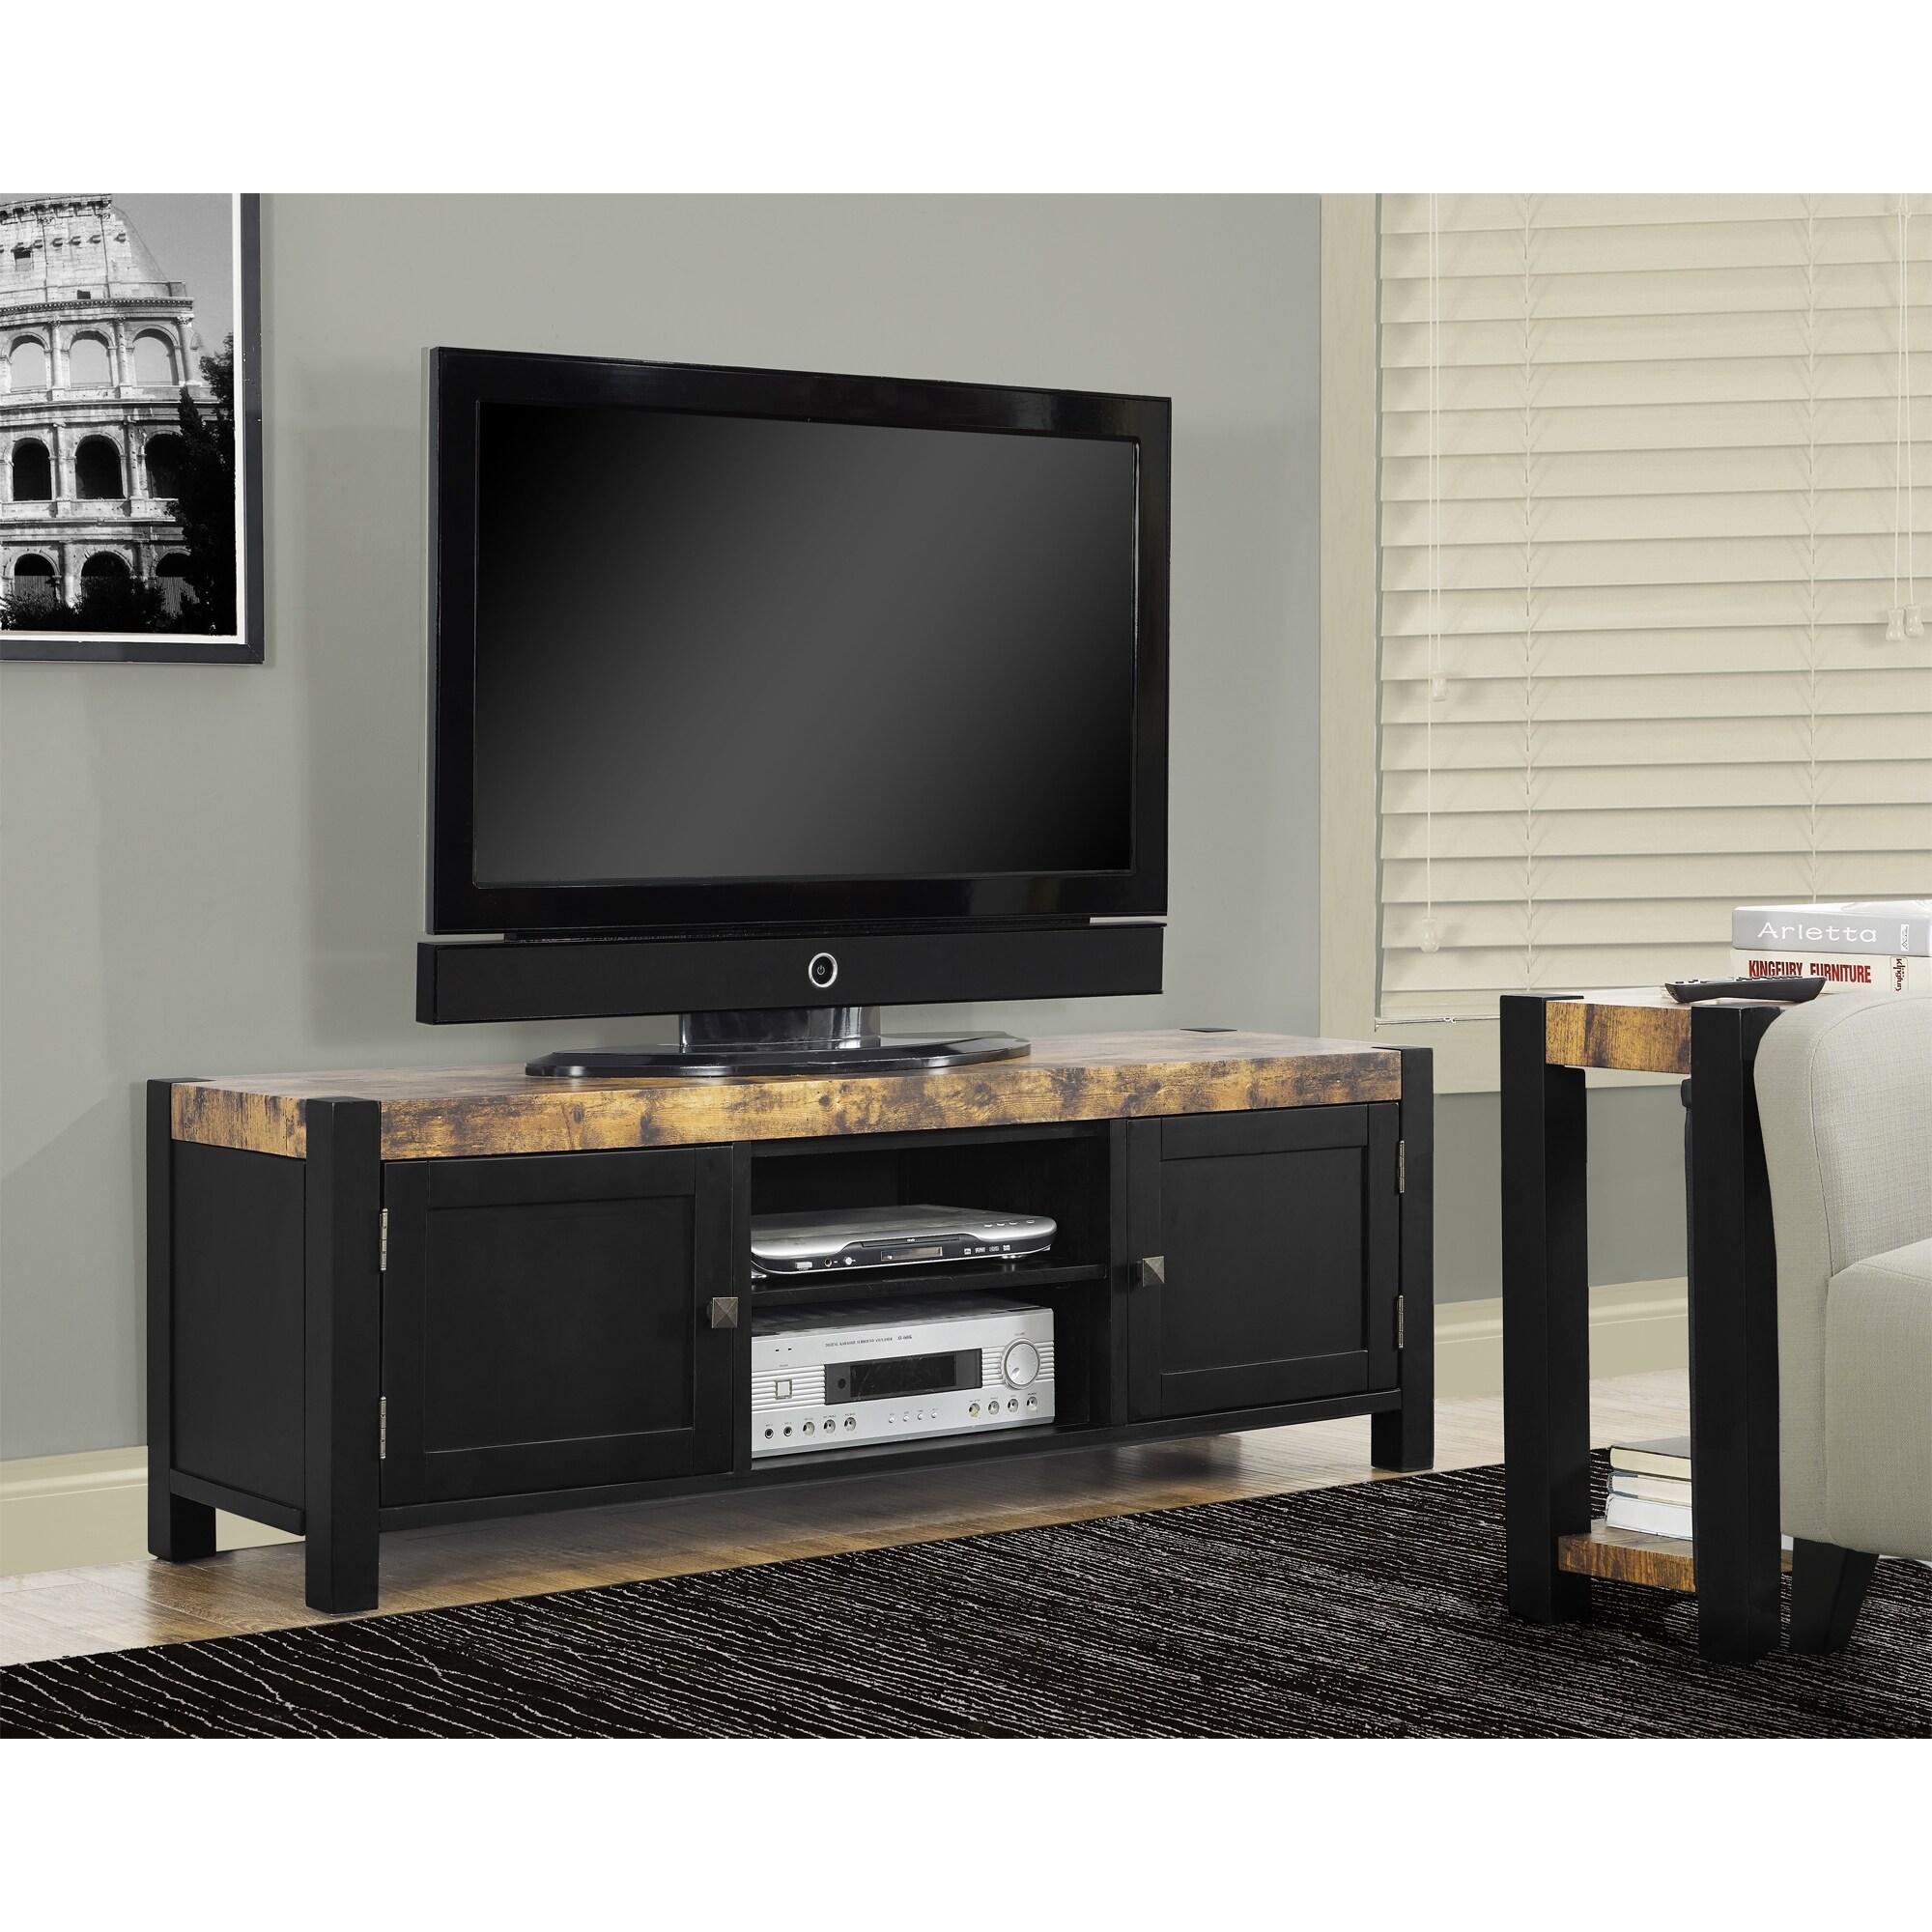 Overstock.com Distressed Black 60-inch TV Console